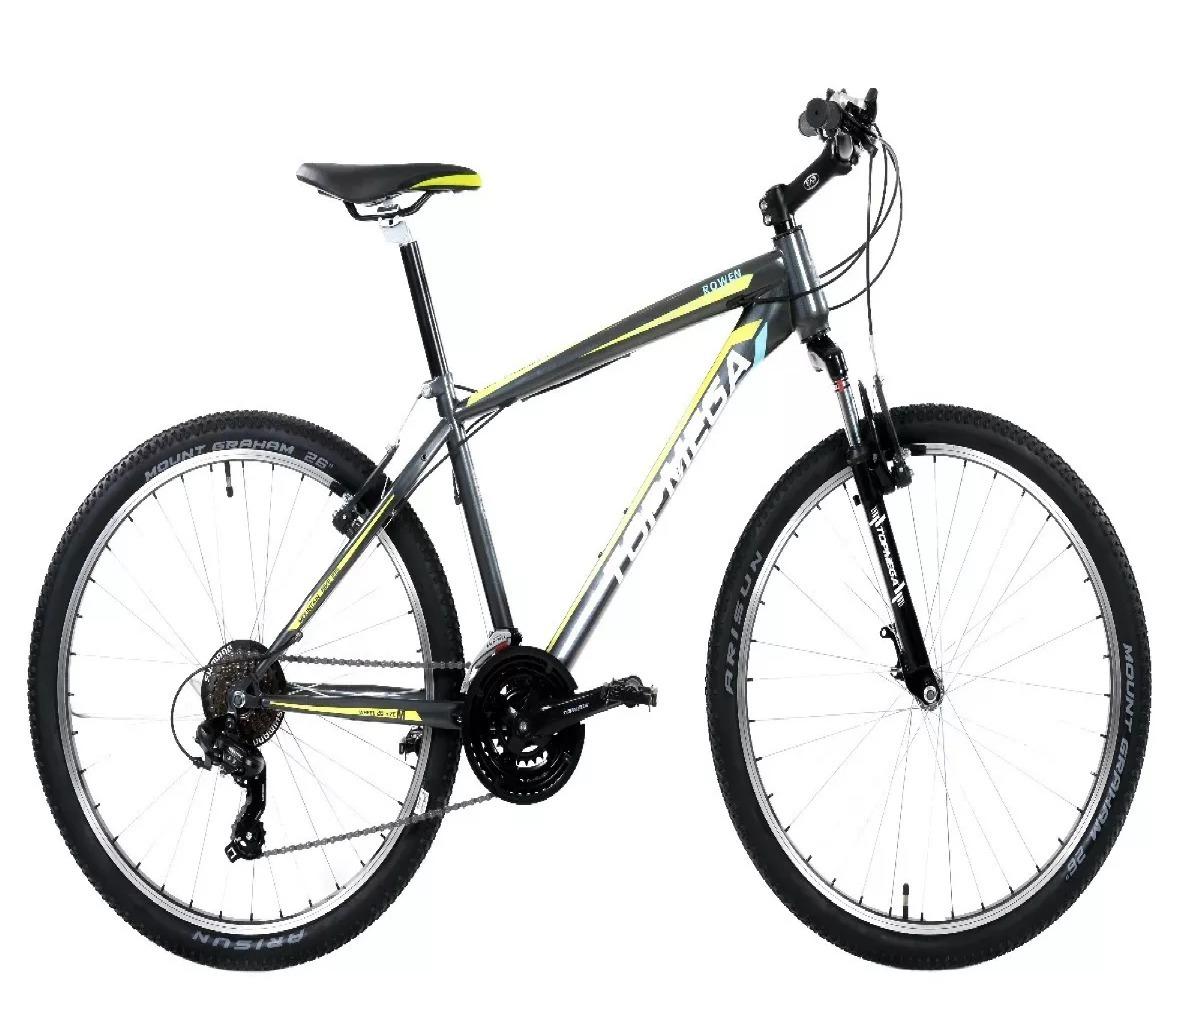 Bicicleta Topmega R26 Rowen Shimano + Cartuchera - $ 11.210,00 en ...